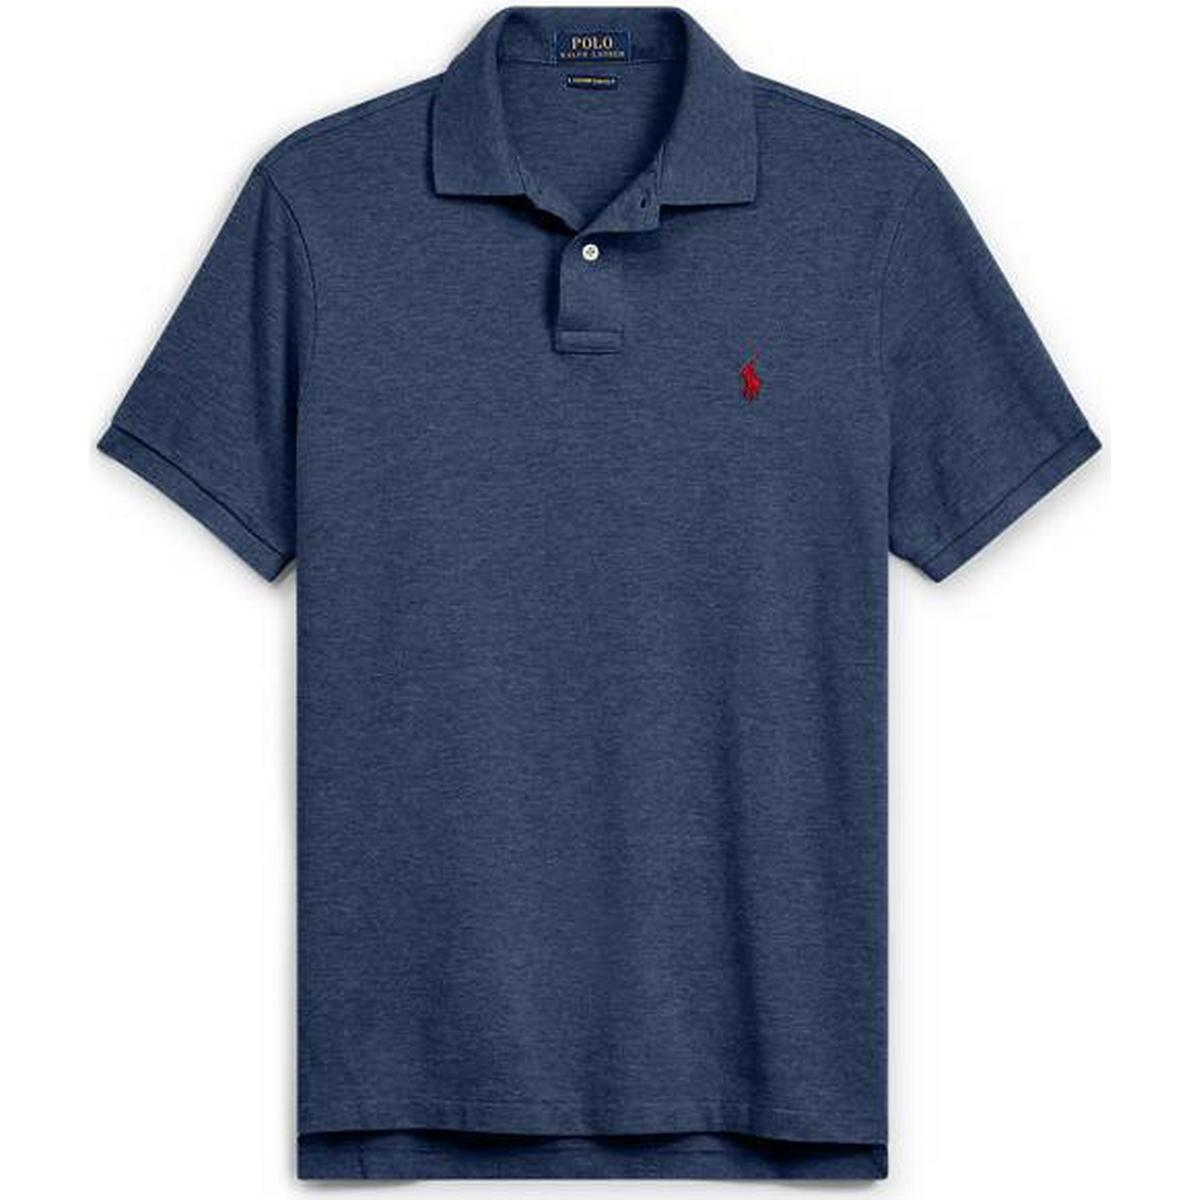 60304f9b820 Polo Ralph Lauren Piké Herrkläder - Jämför priser på PriceRunner